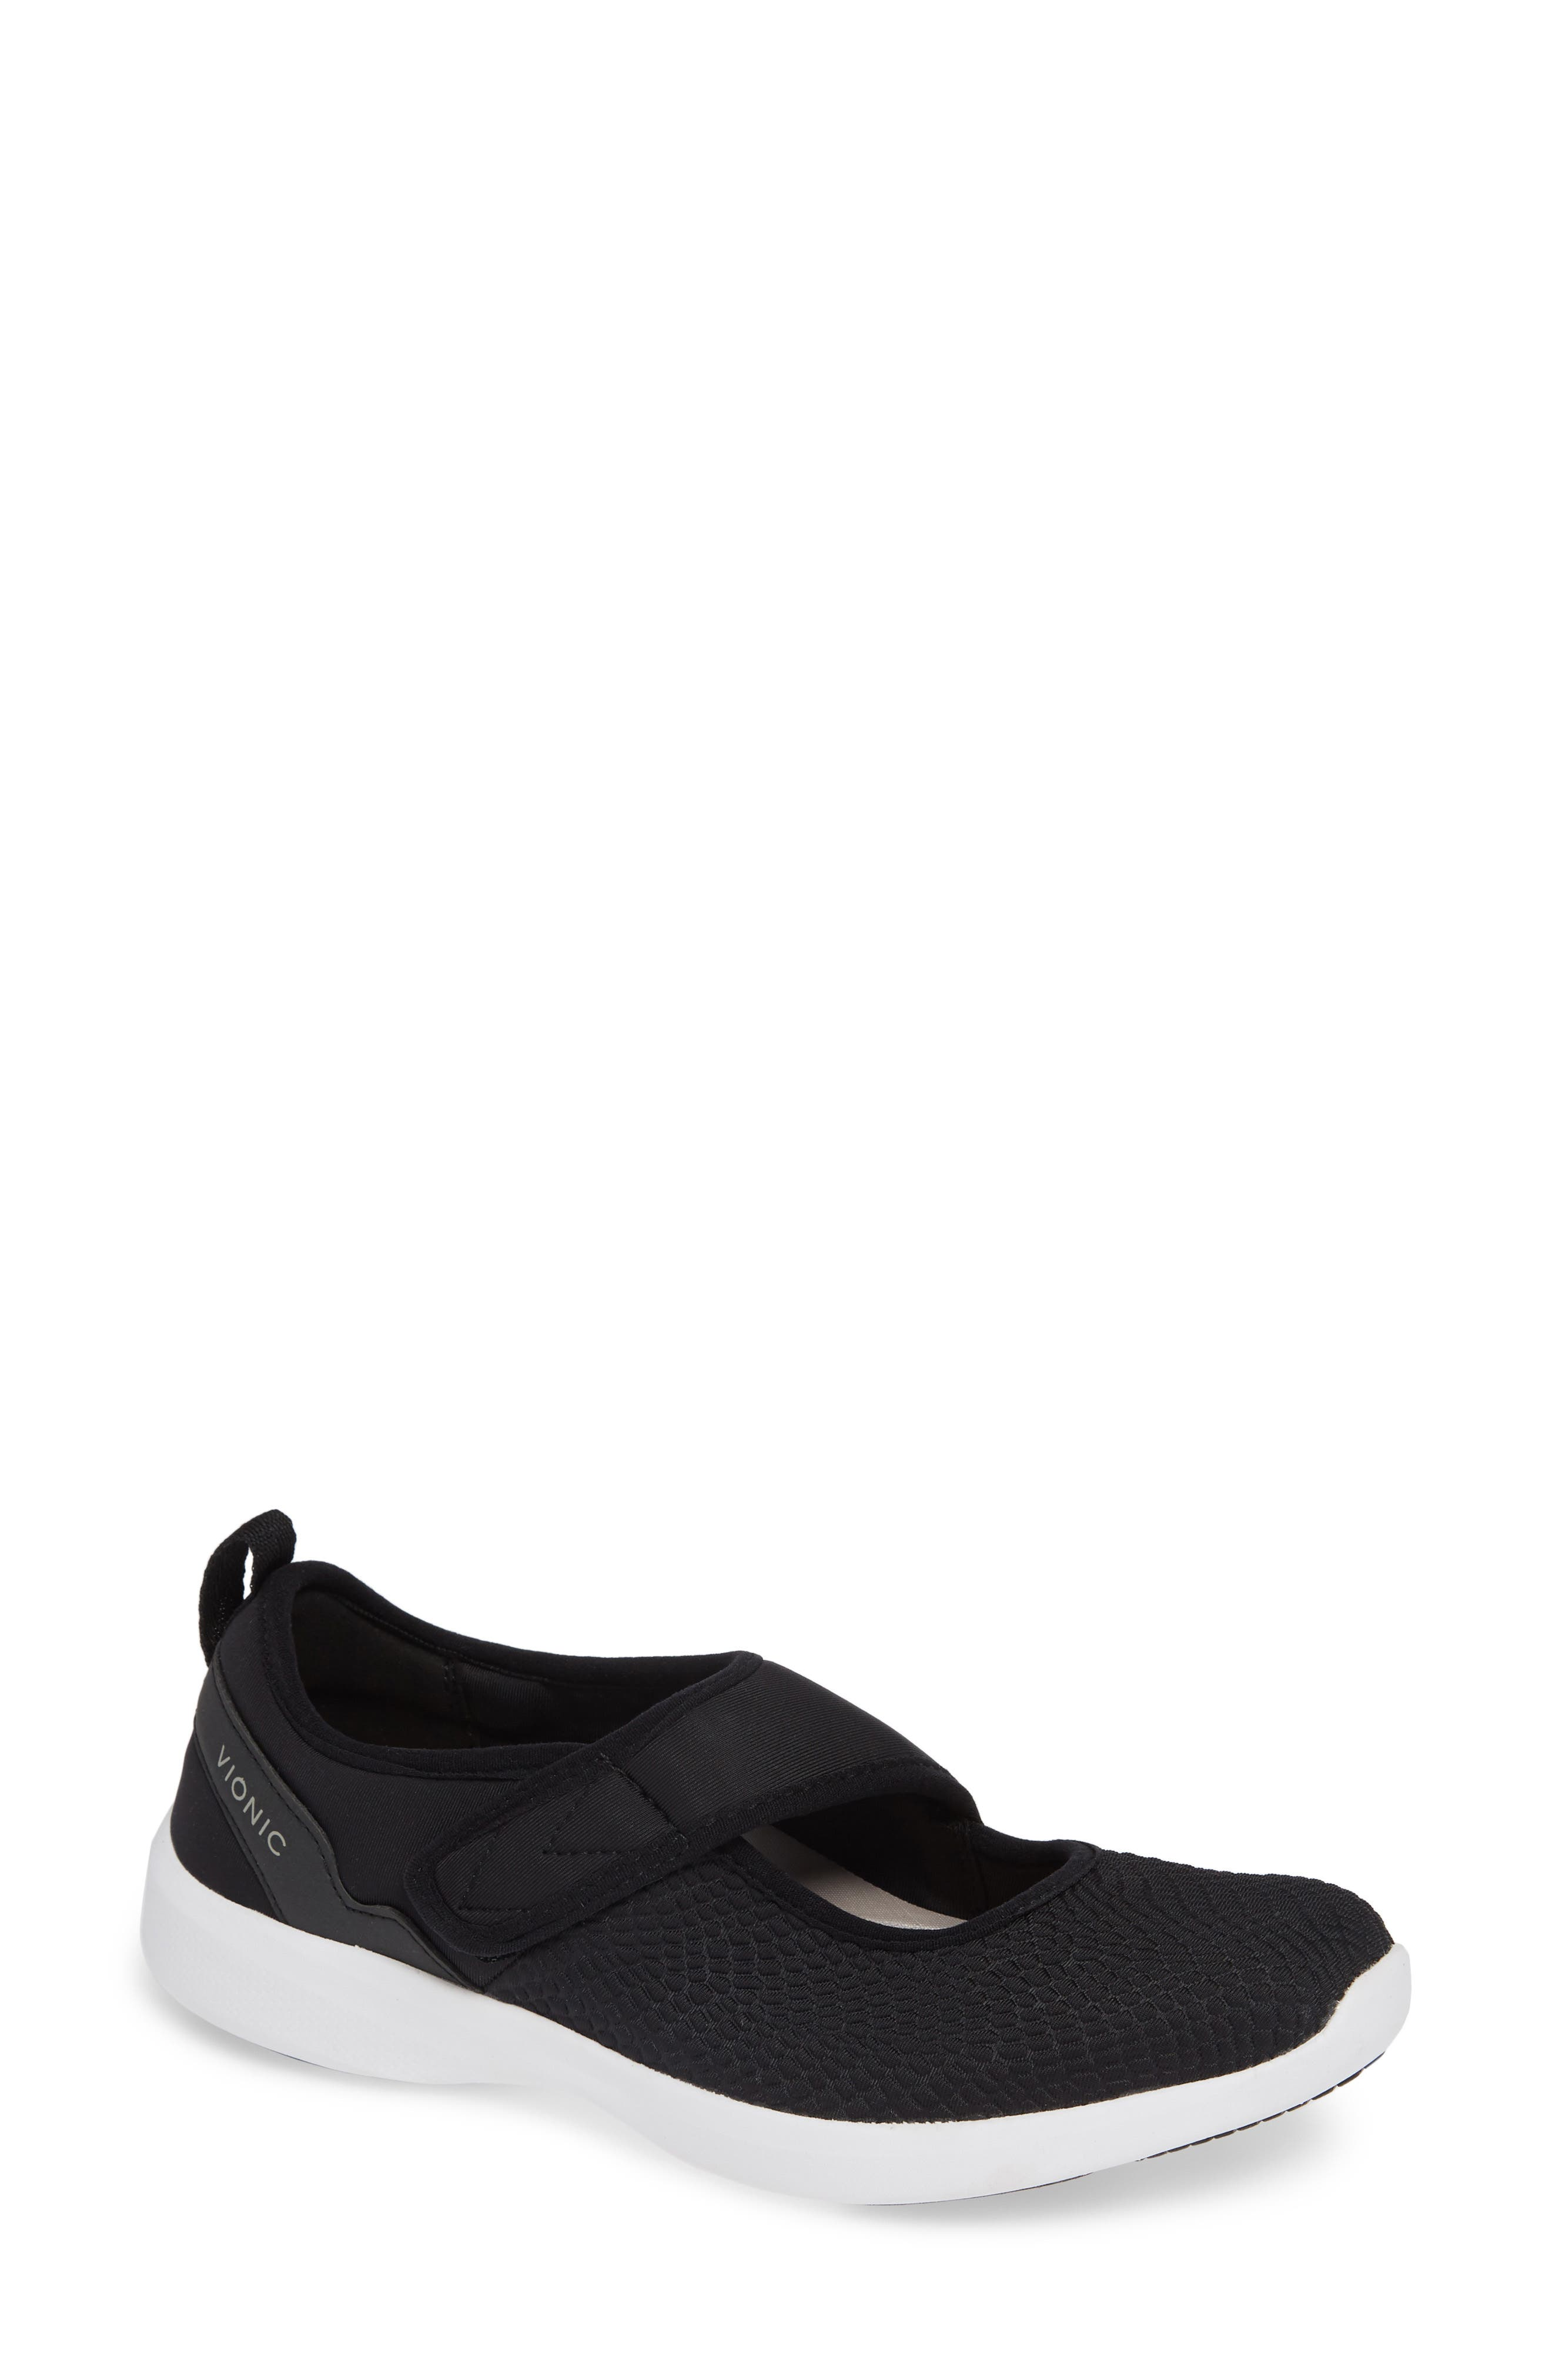 Sonnet Sneaker,                             Main thumbnail 1, color,                             BLACK FABRIC